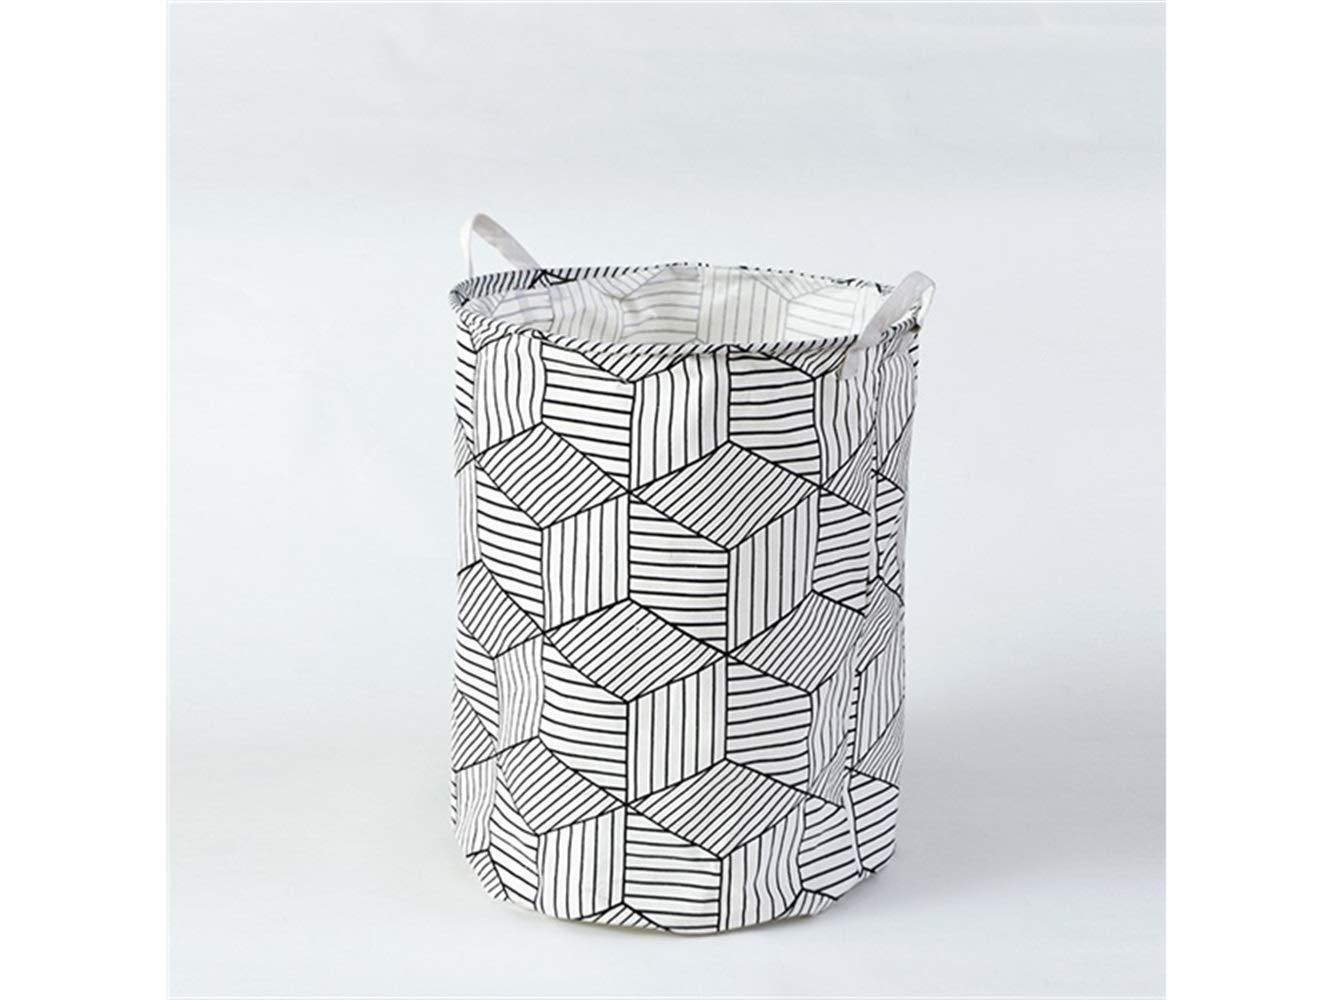 Yunqir Storage Box Cube Pattern Storage Box Laundry Basket Cotton and Linen Storage Box (White)